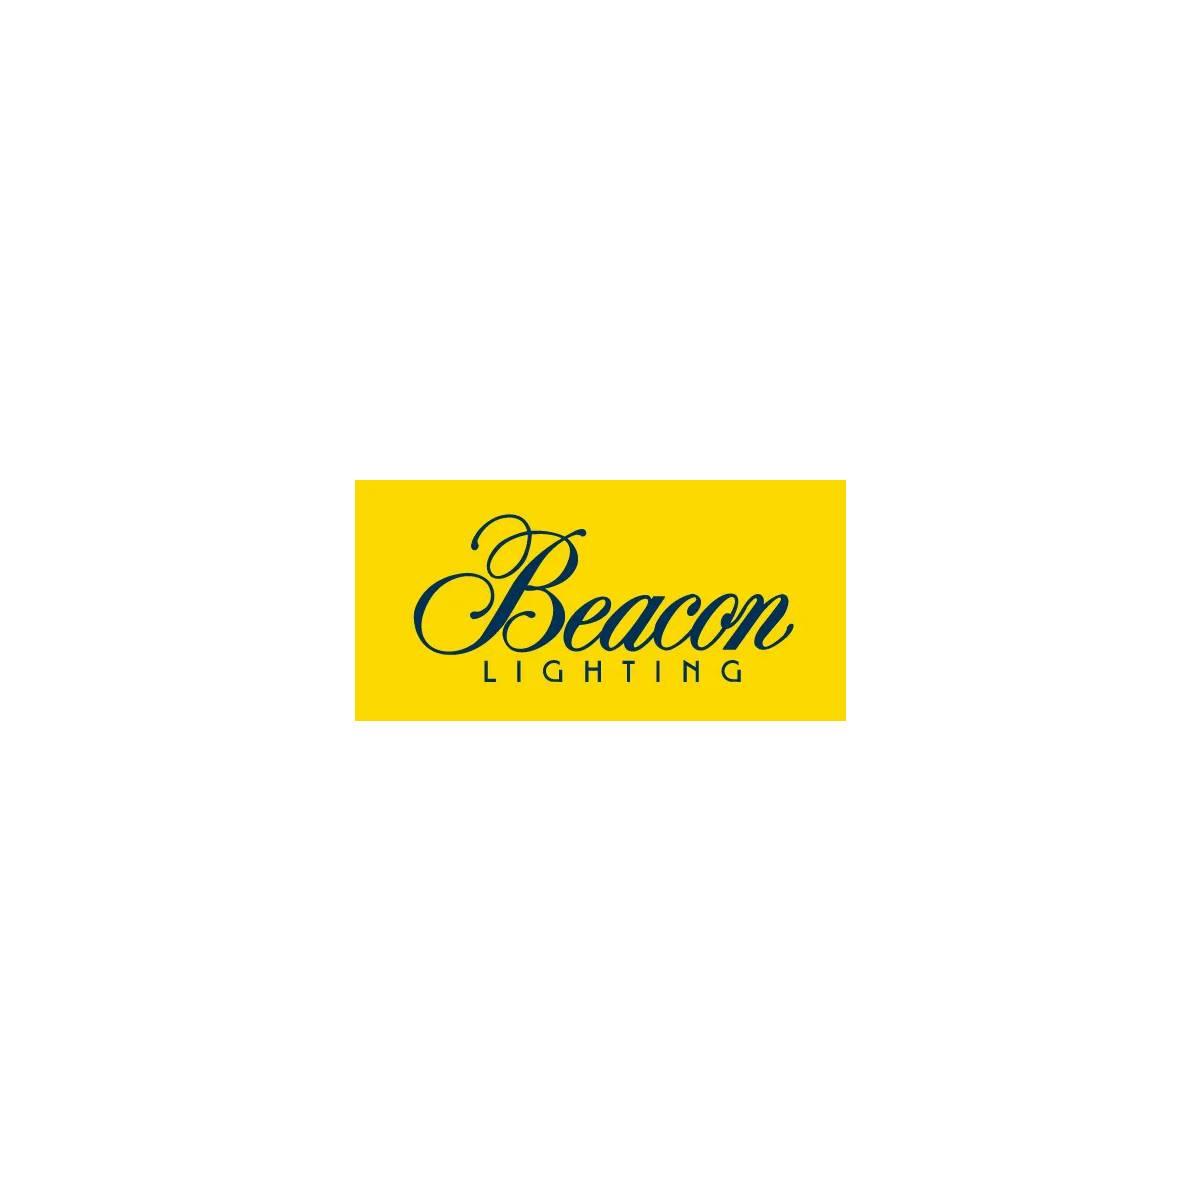 Beacon Lighting Gift Card